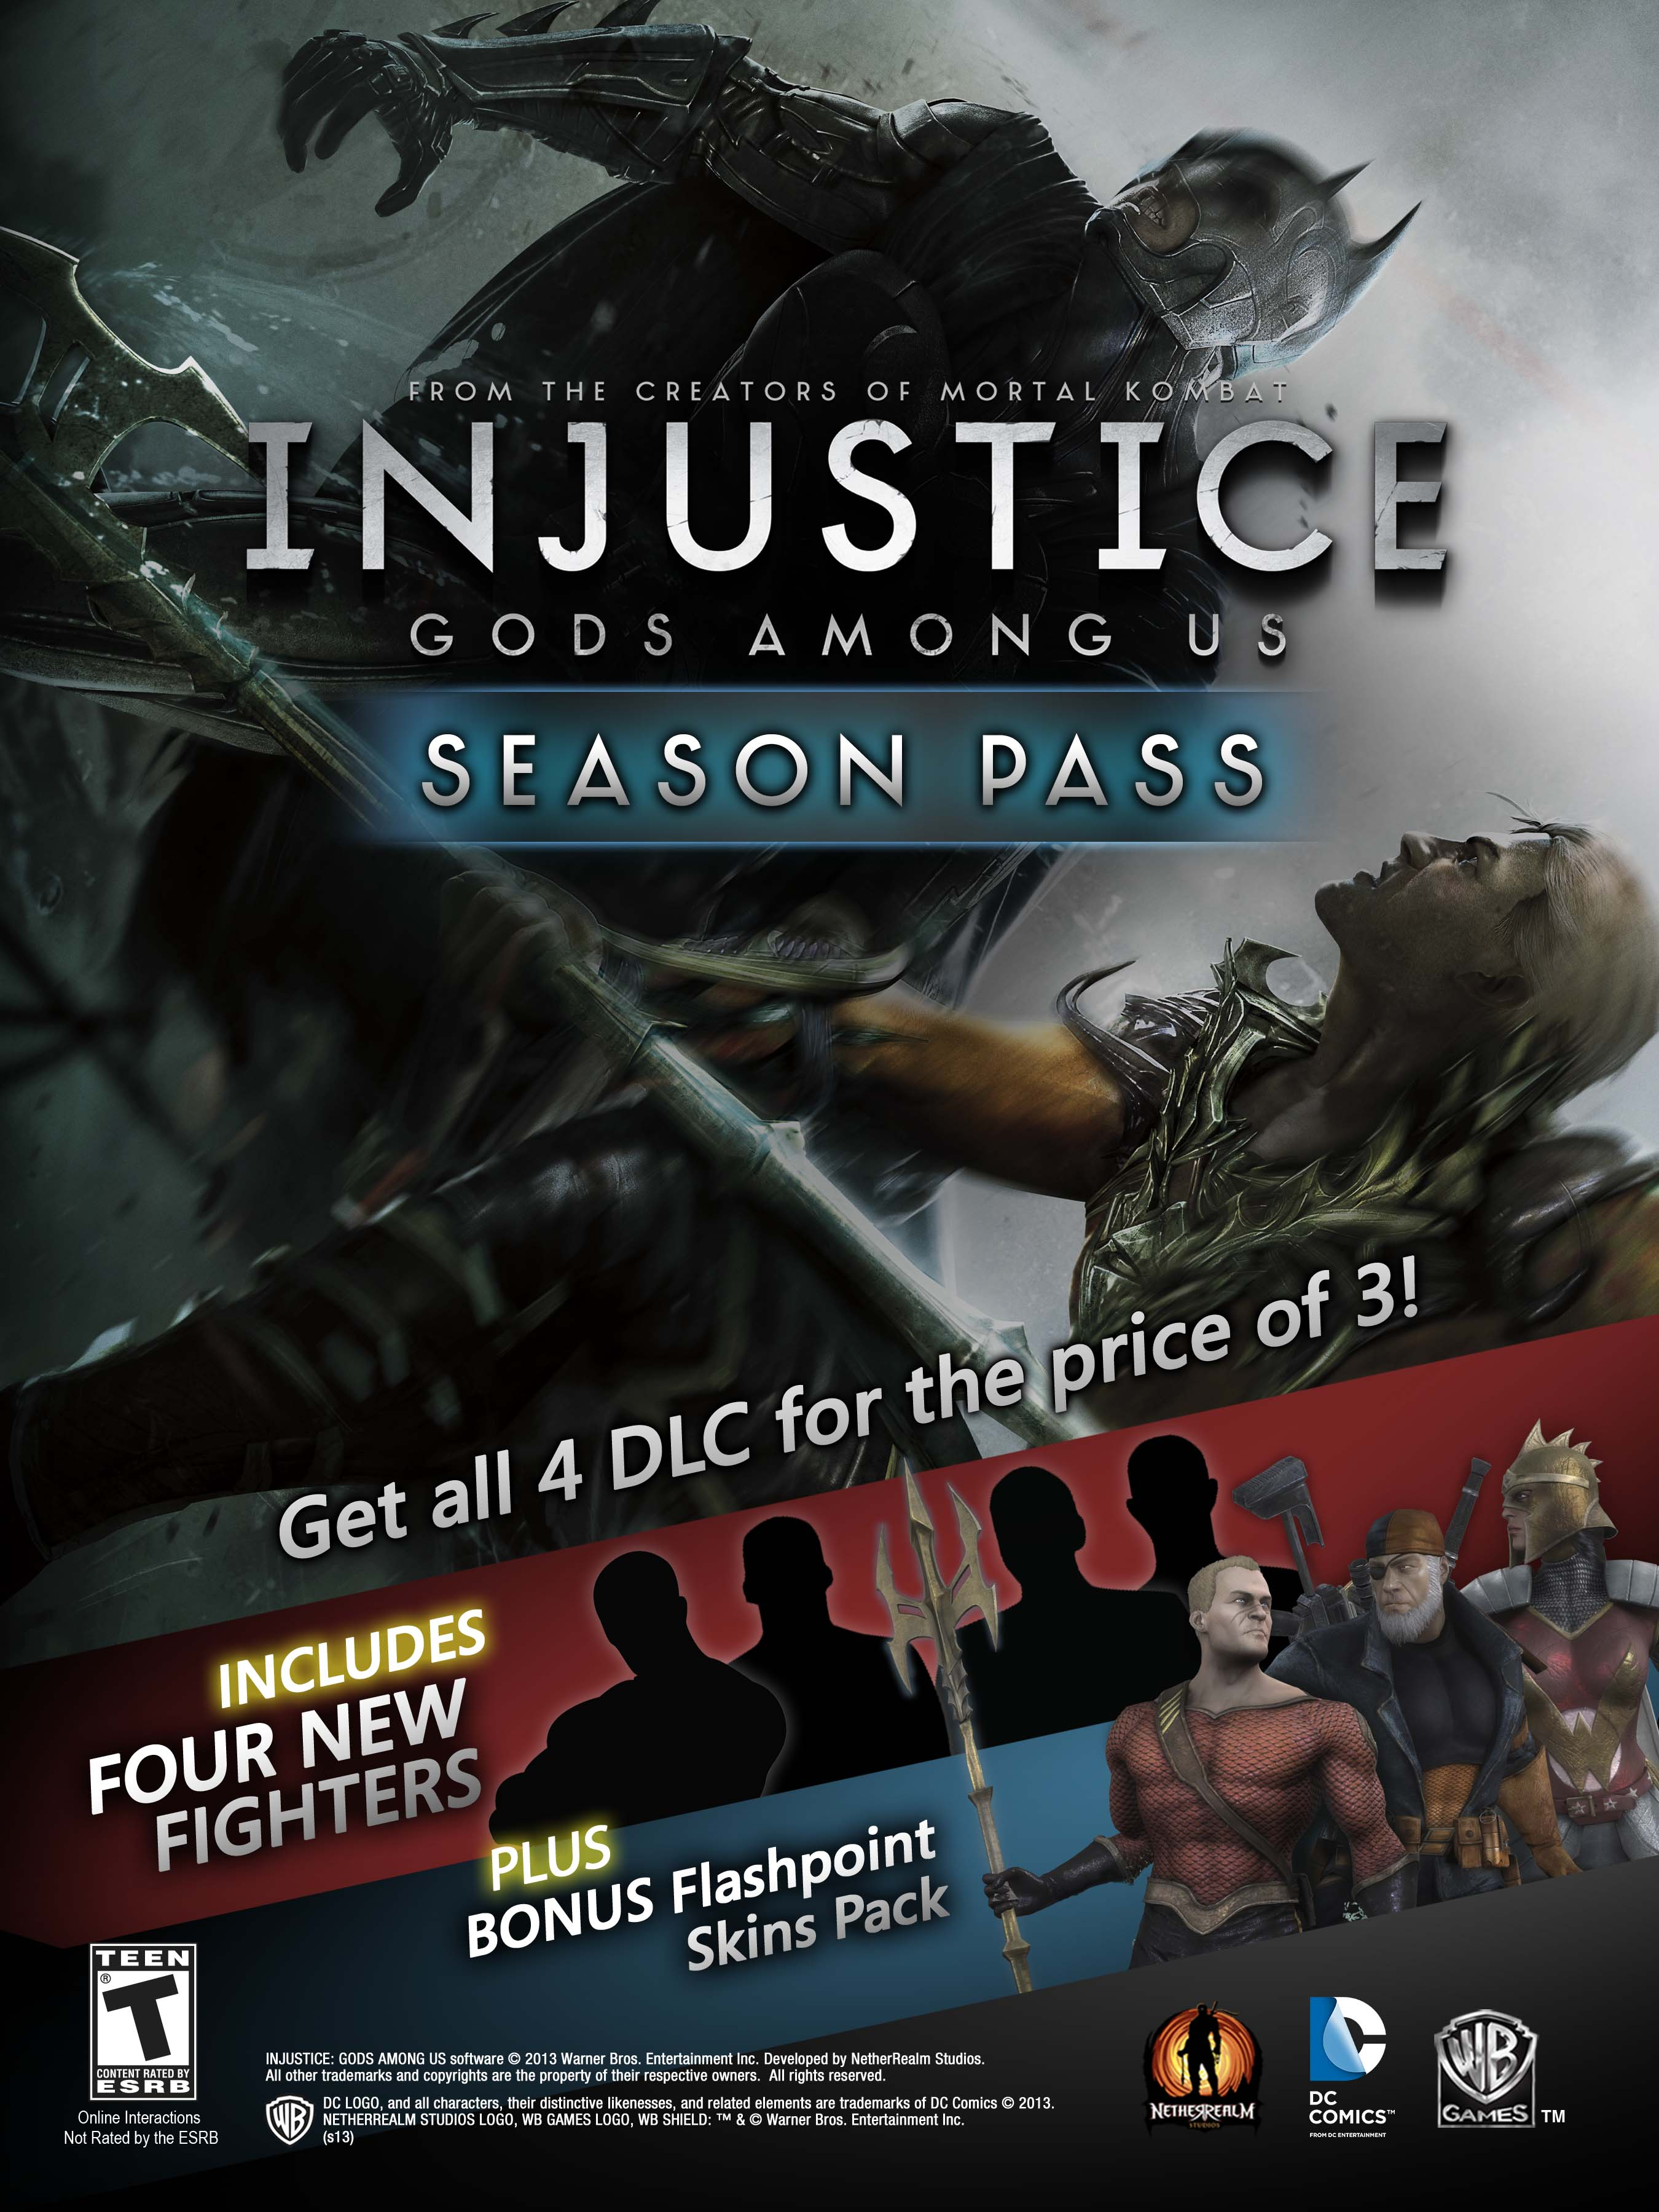 Injustice_SeasonPass_6a